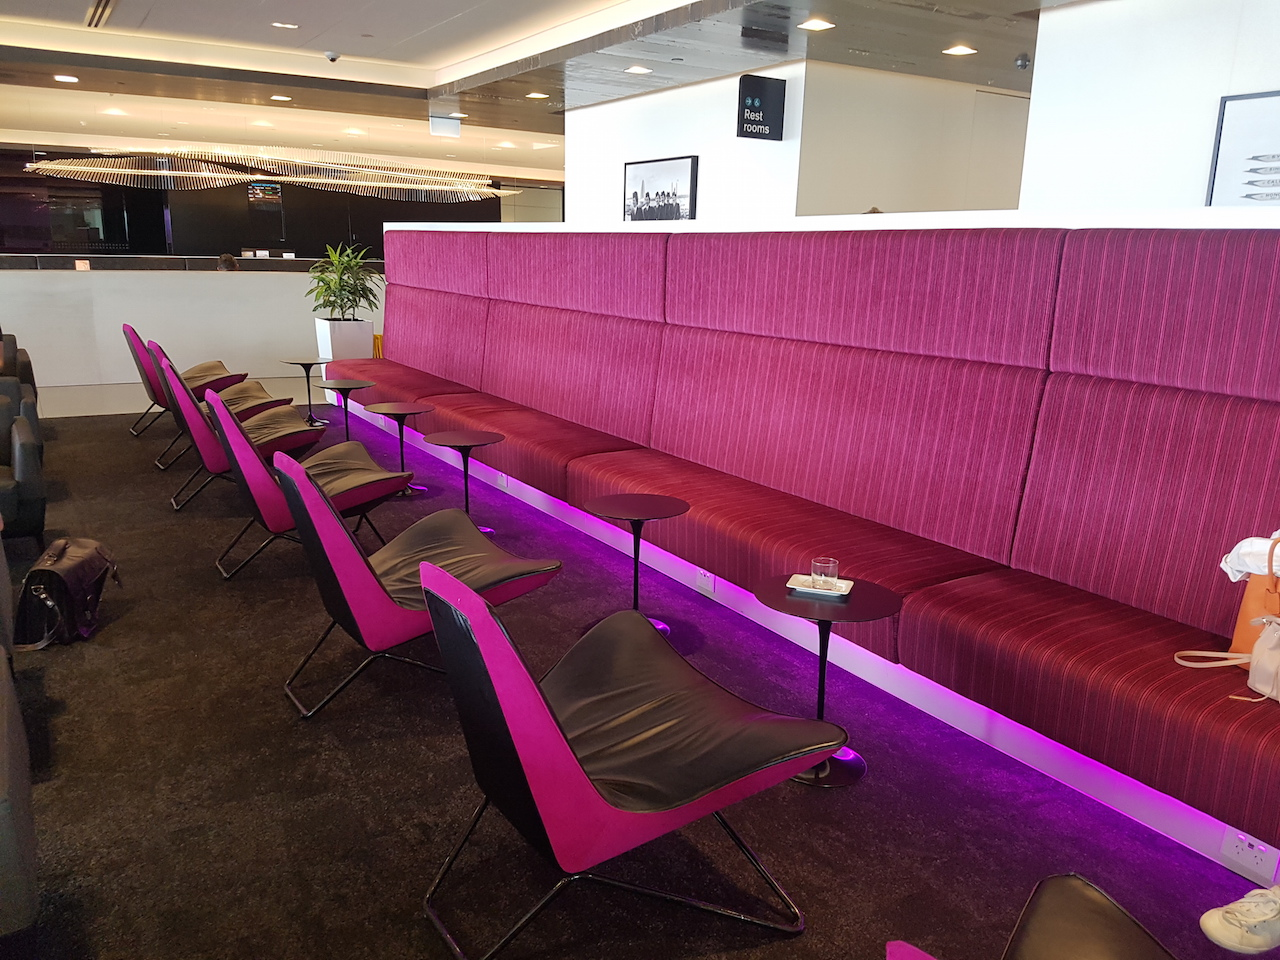 air new zealand lounge auckland international. Black Bedroom Furniture Sets. Home Design Ideas